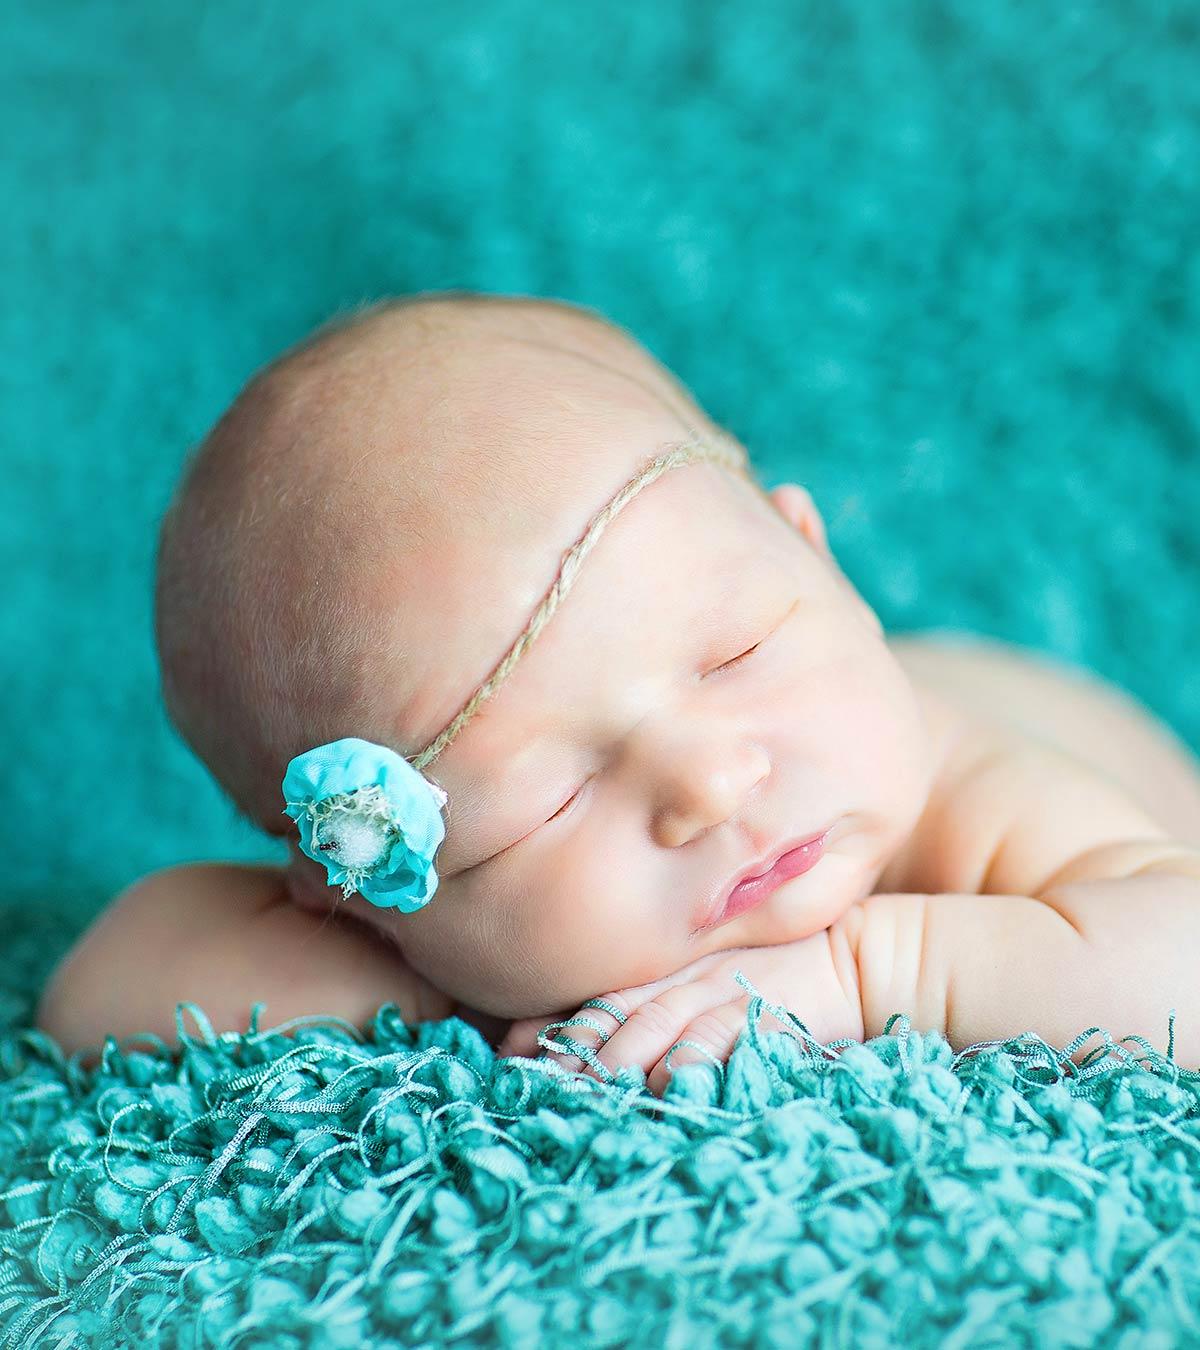 Top 15 Ugandan Names For Your Baby